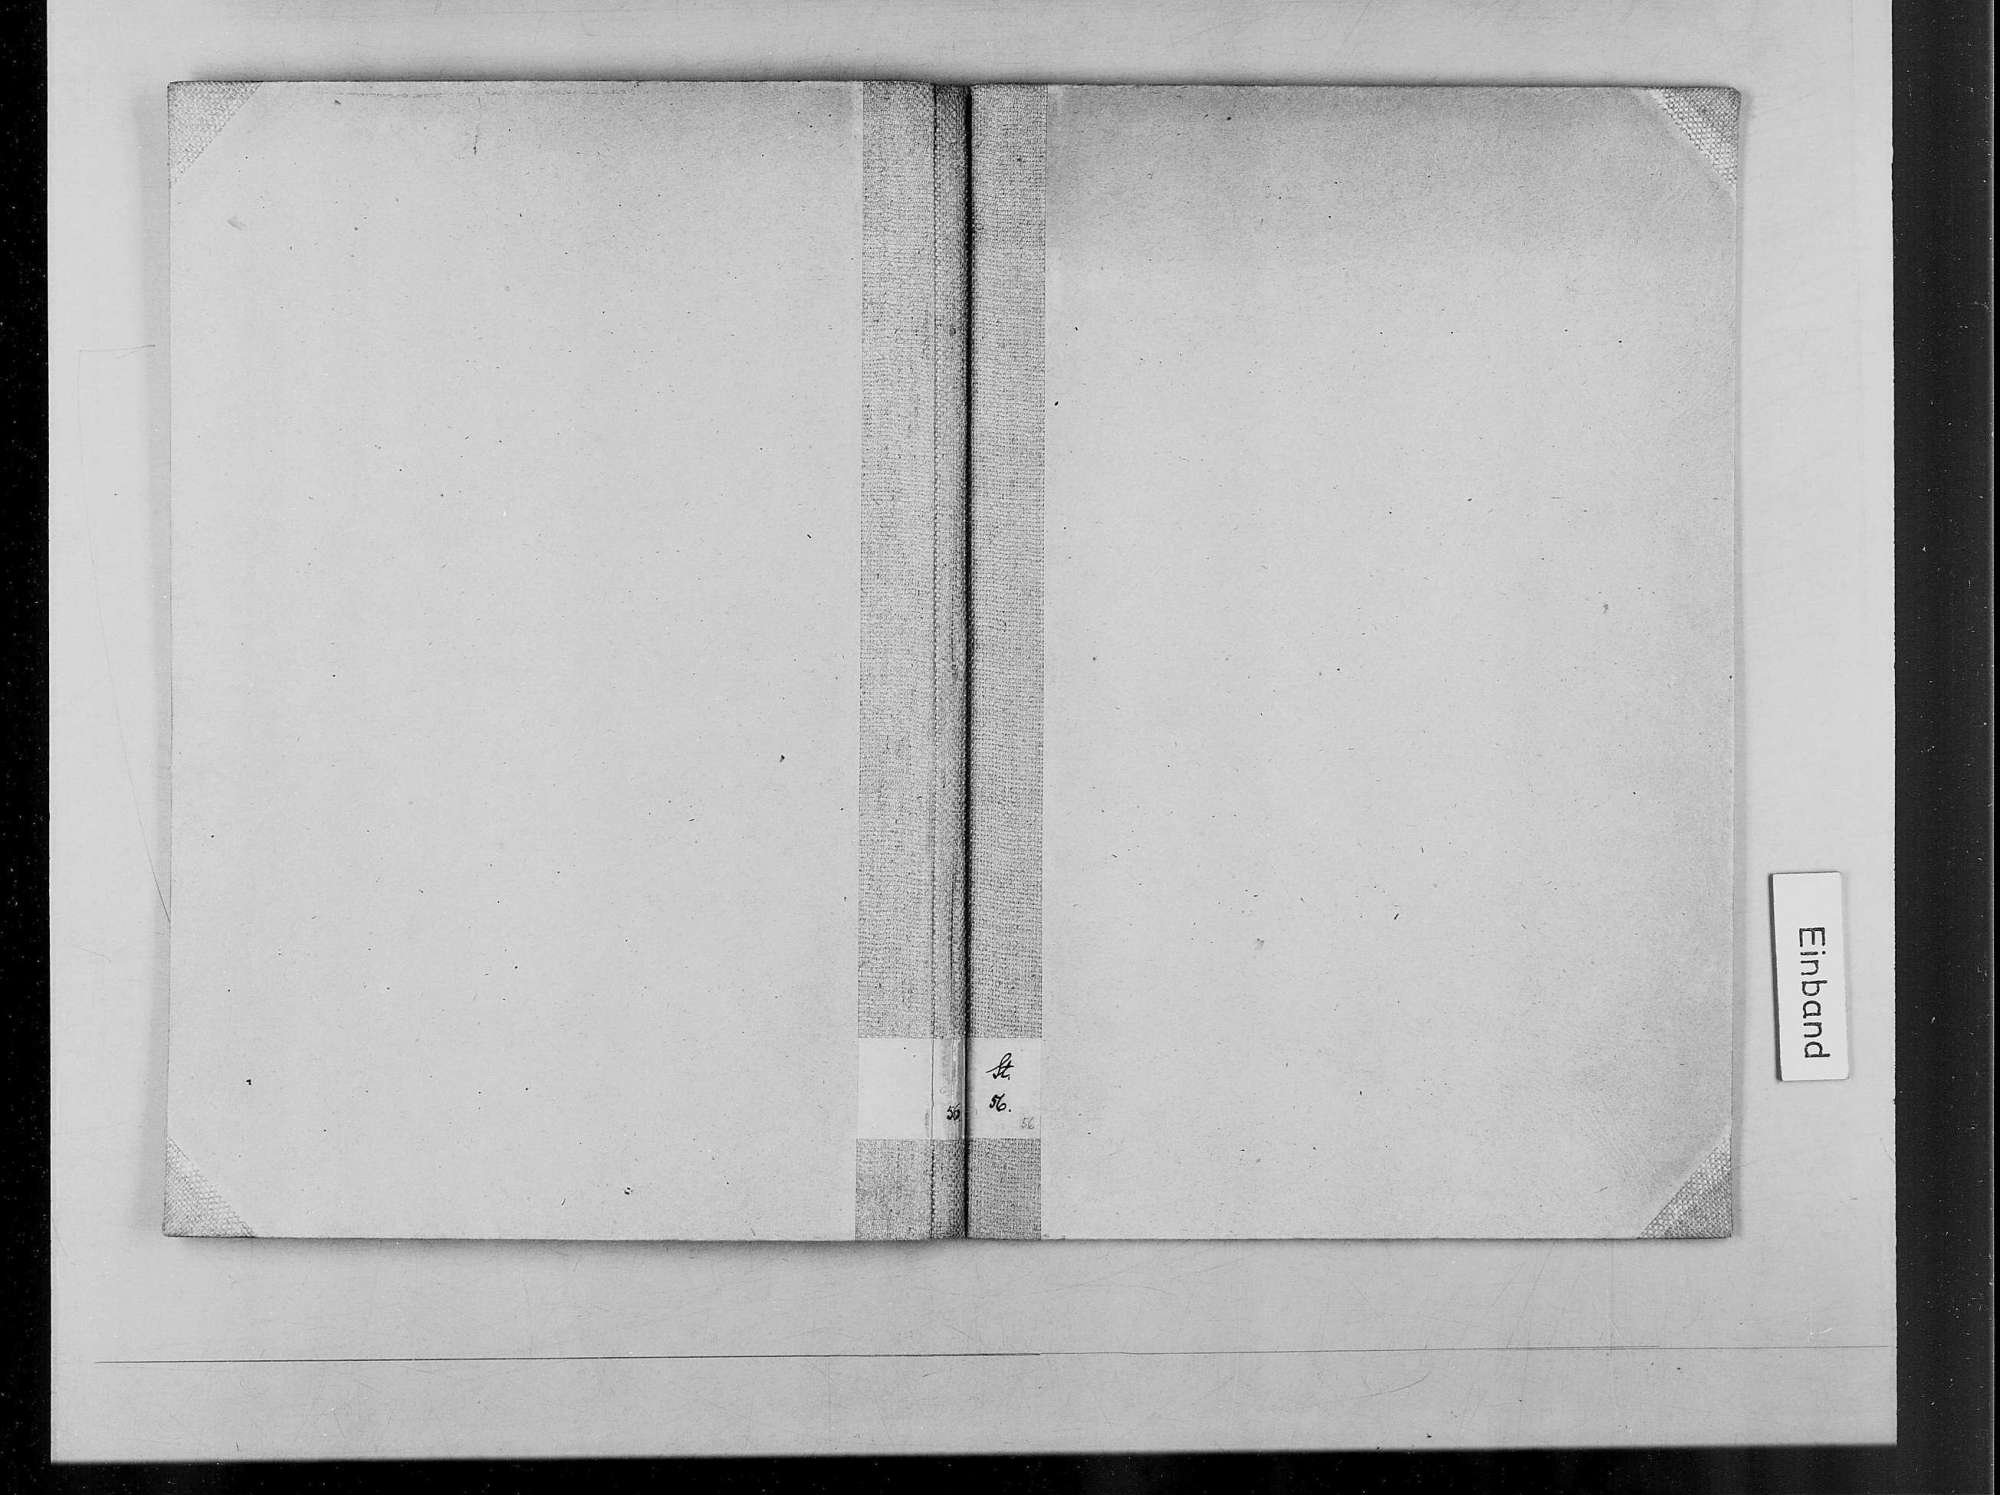 Kl. Murrhardt, Bild 1